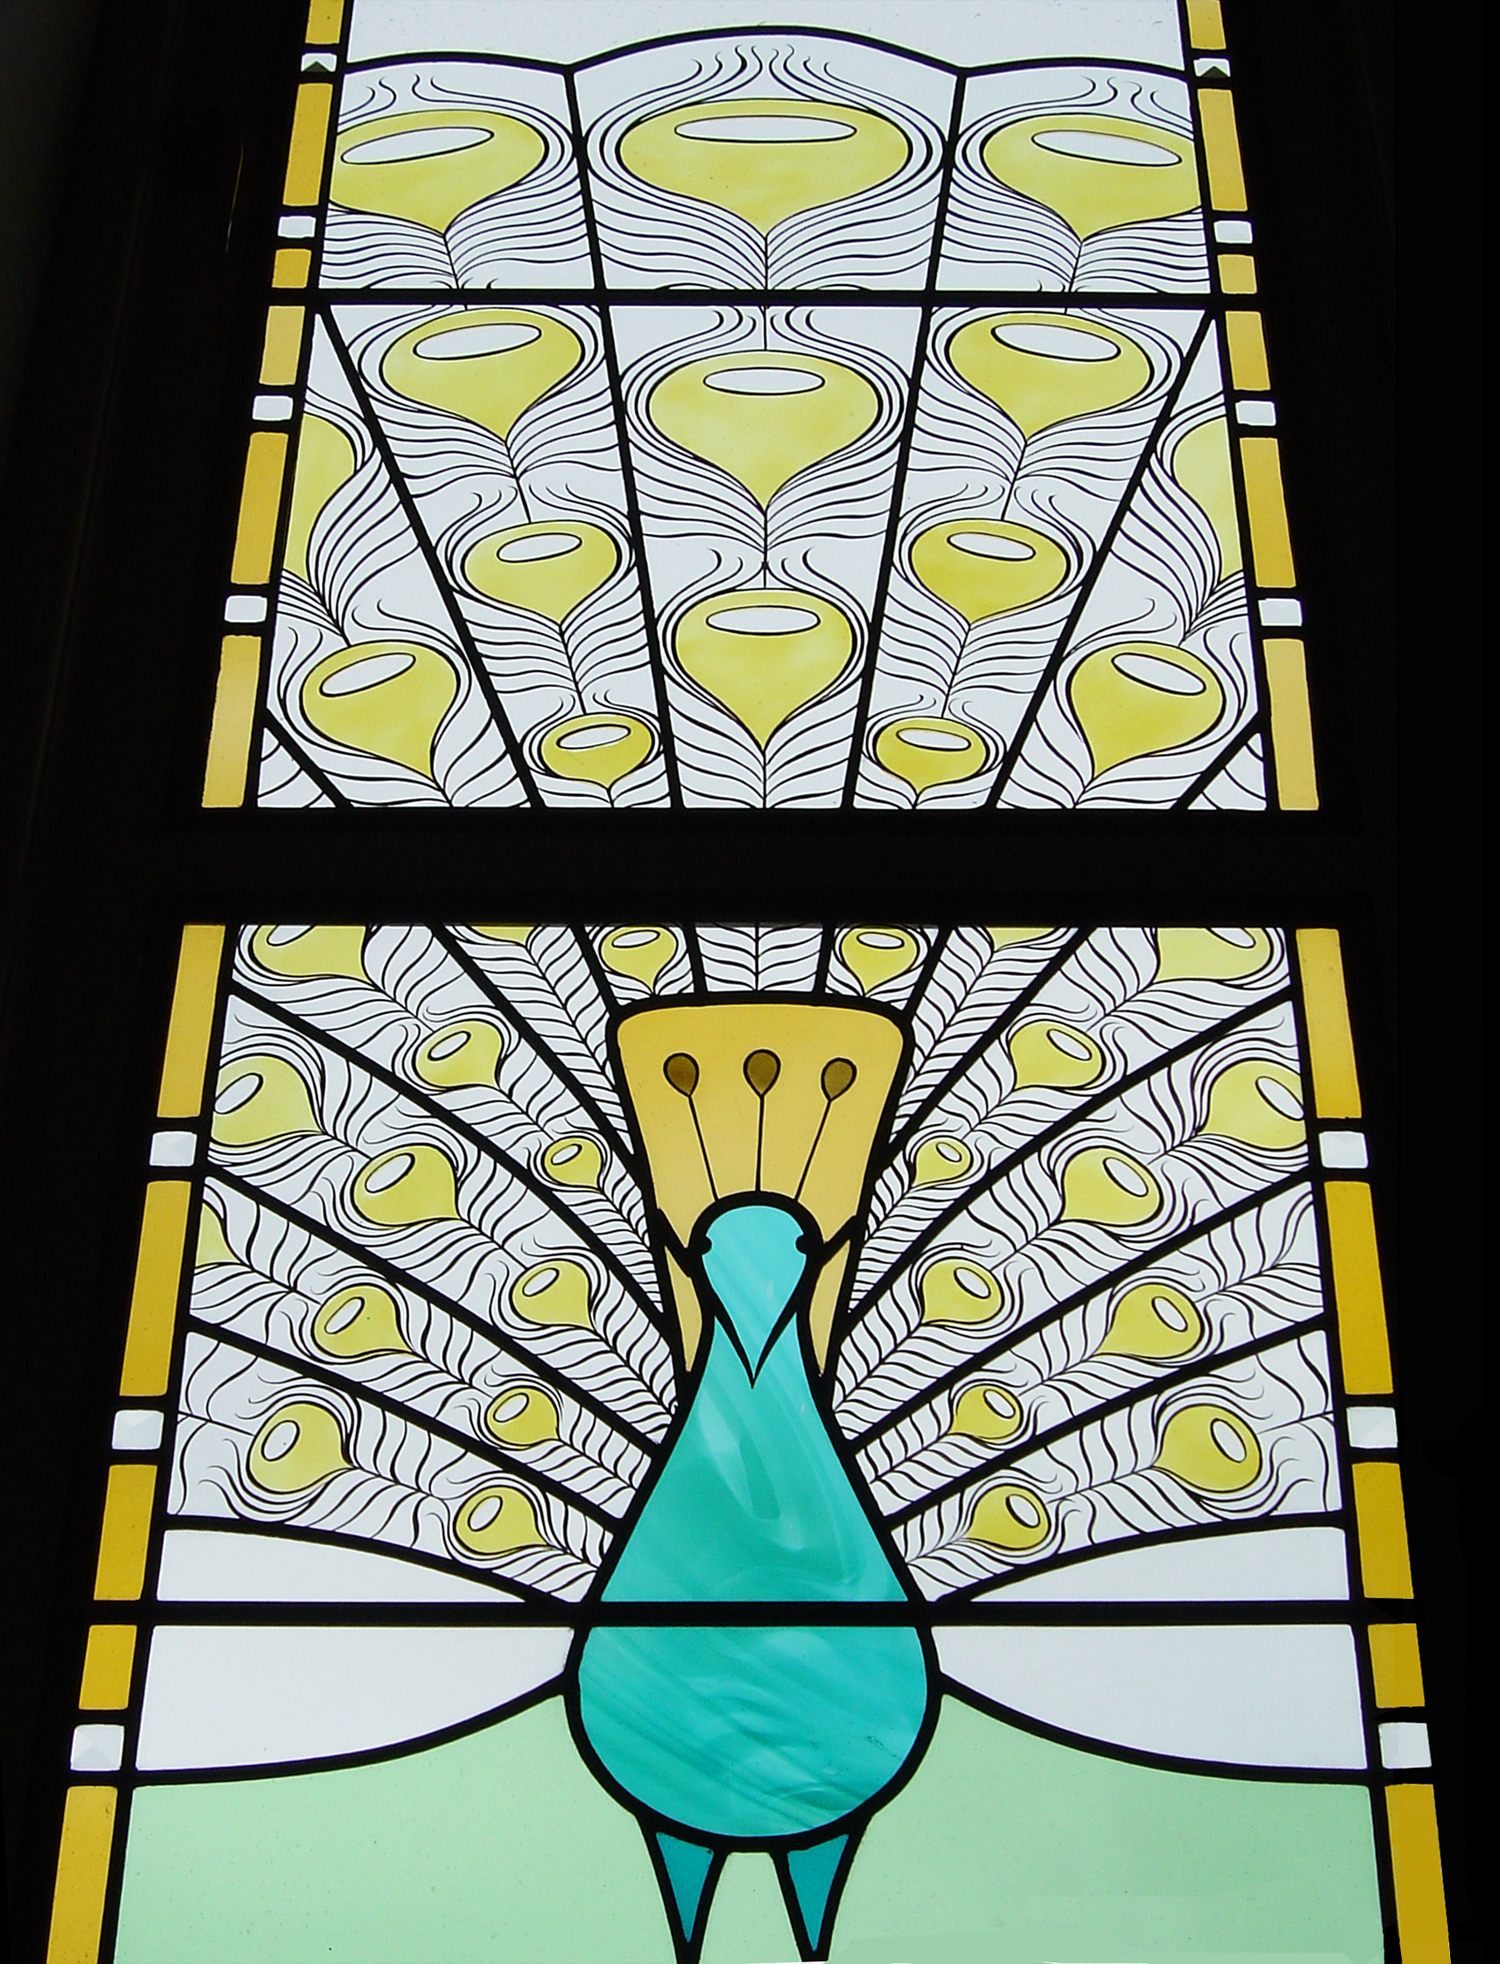 Detail of Peacock windows, Caterham.